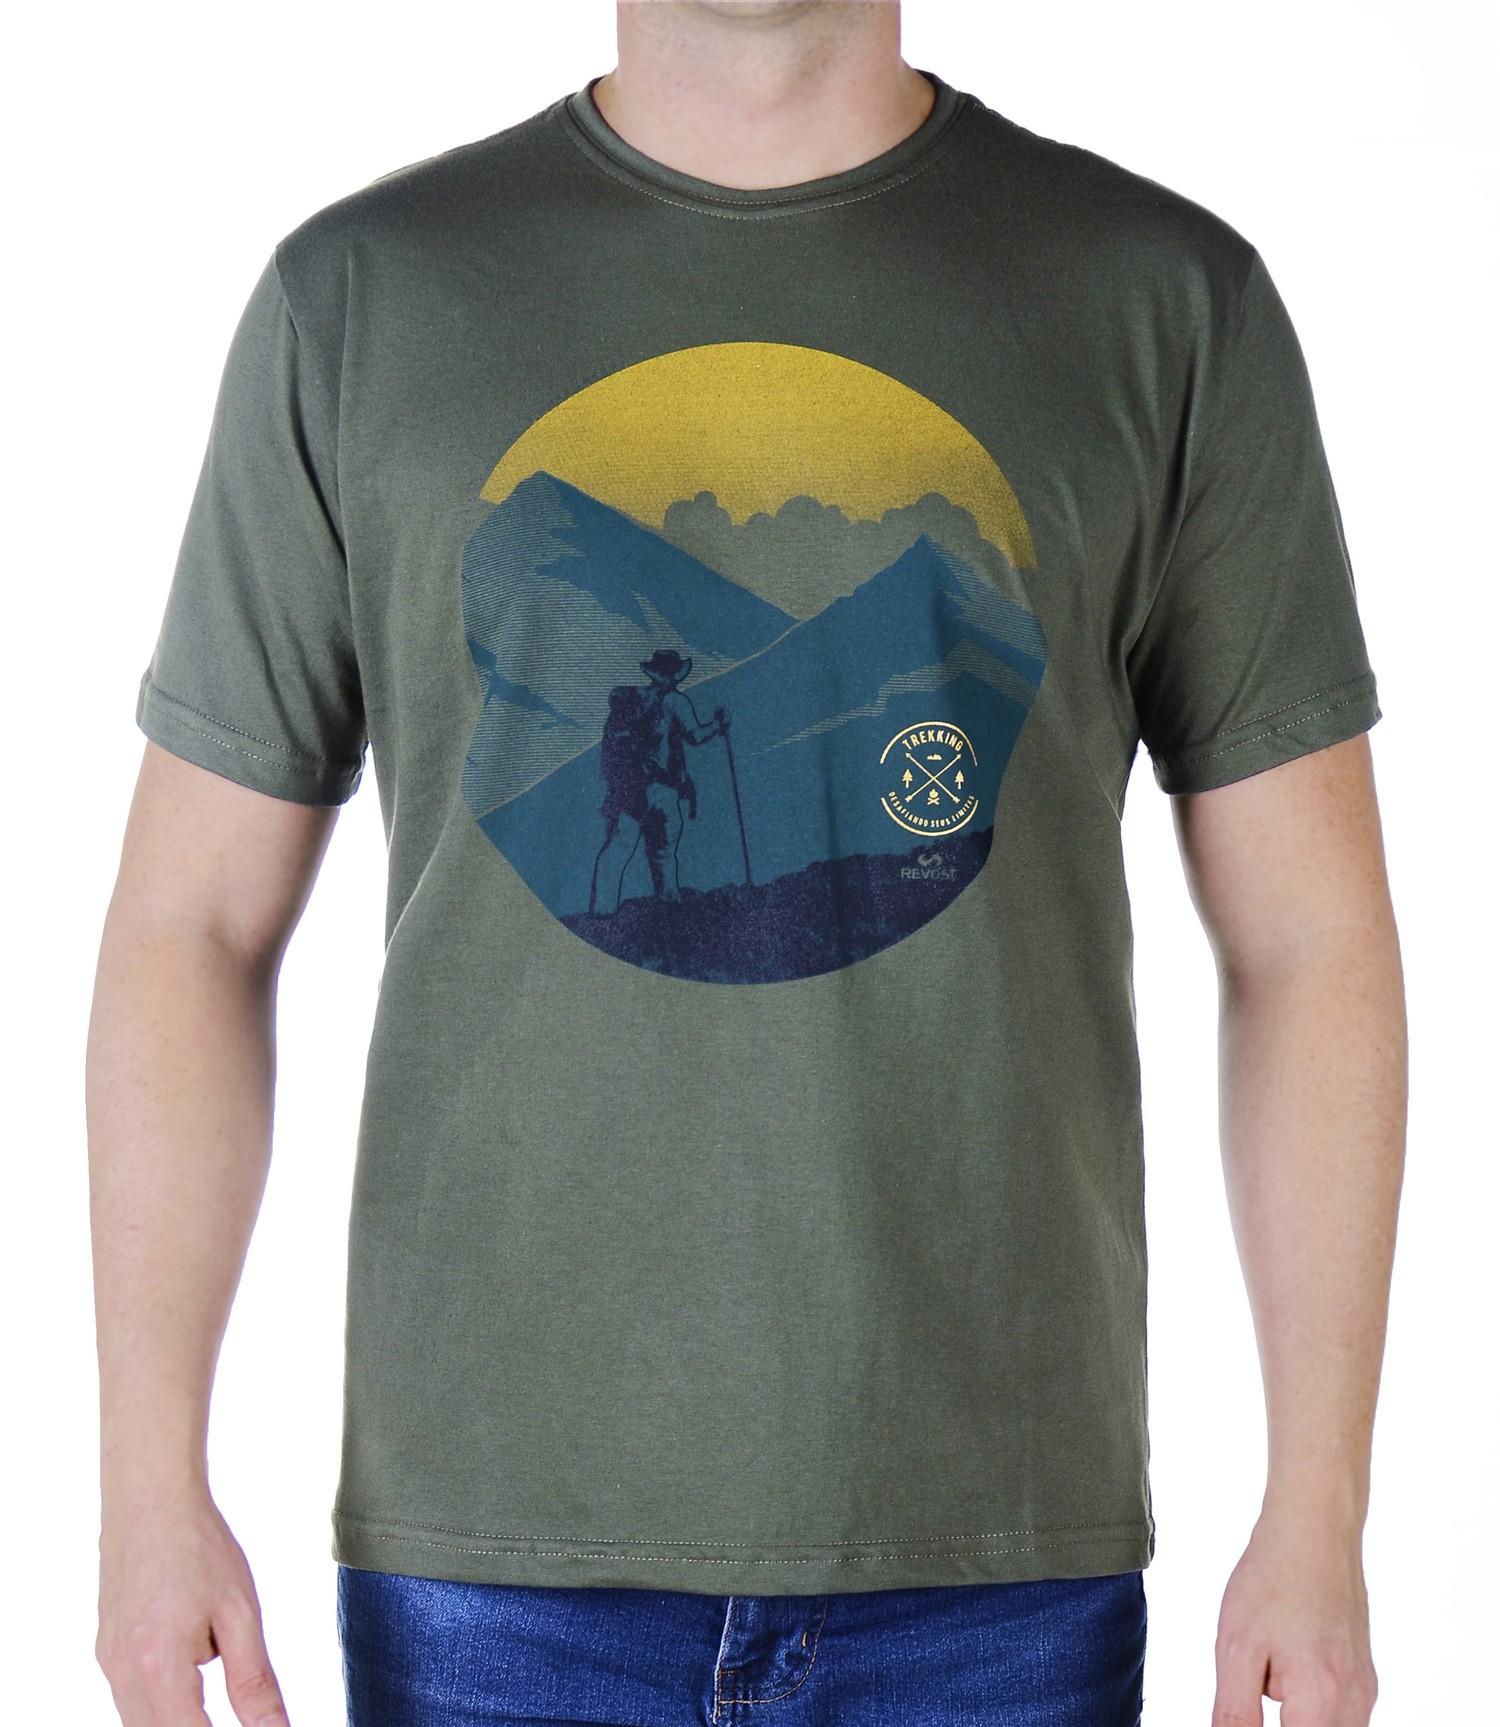 Camiseta Masculina Revost Trekking - Verde musgo